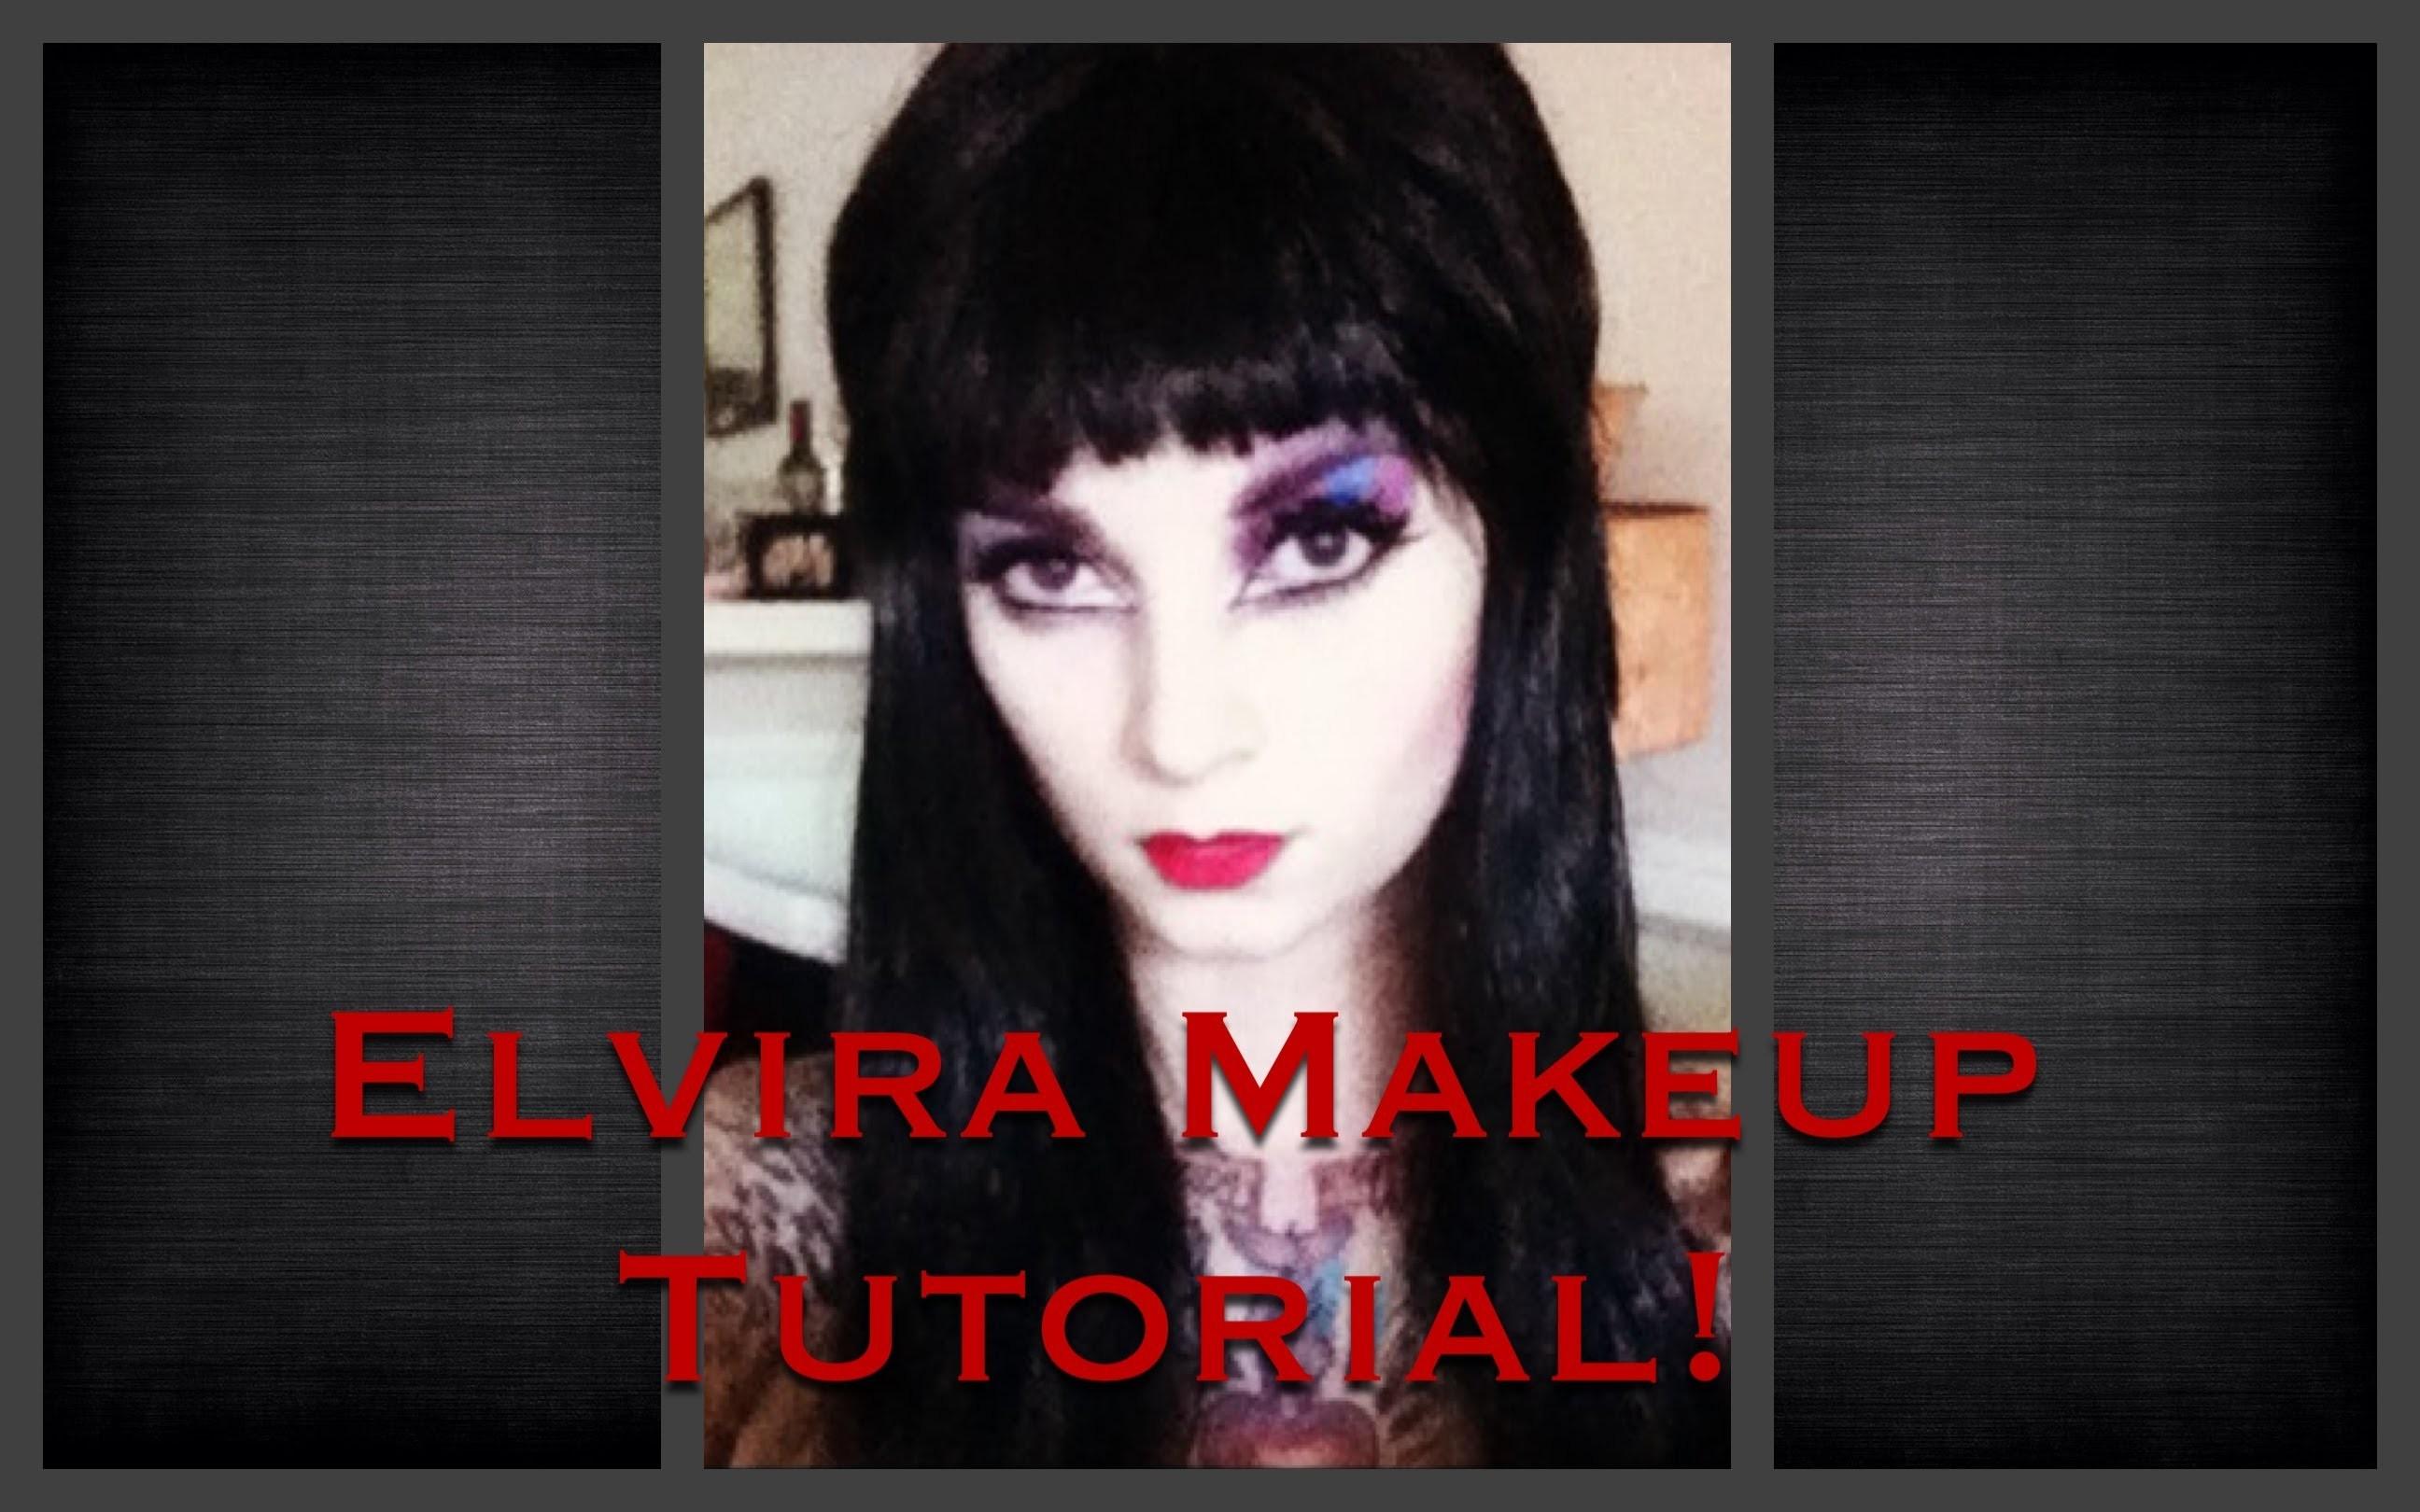 Elvira Makeup Tutorial for Halloween by CHERRY DOLLFACE .